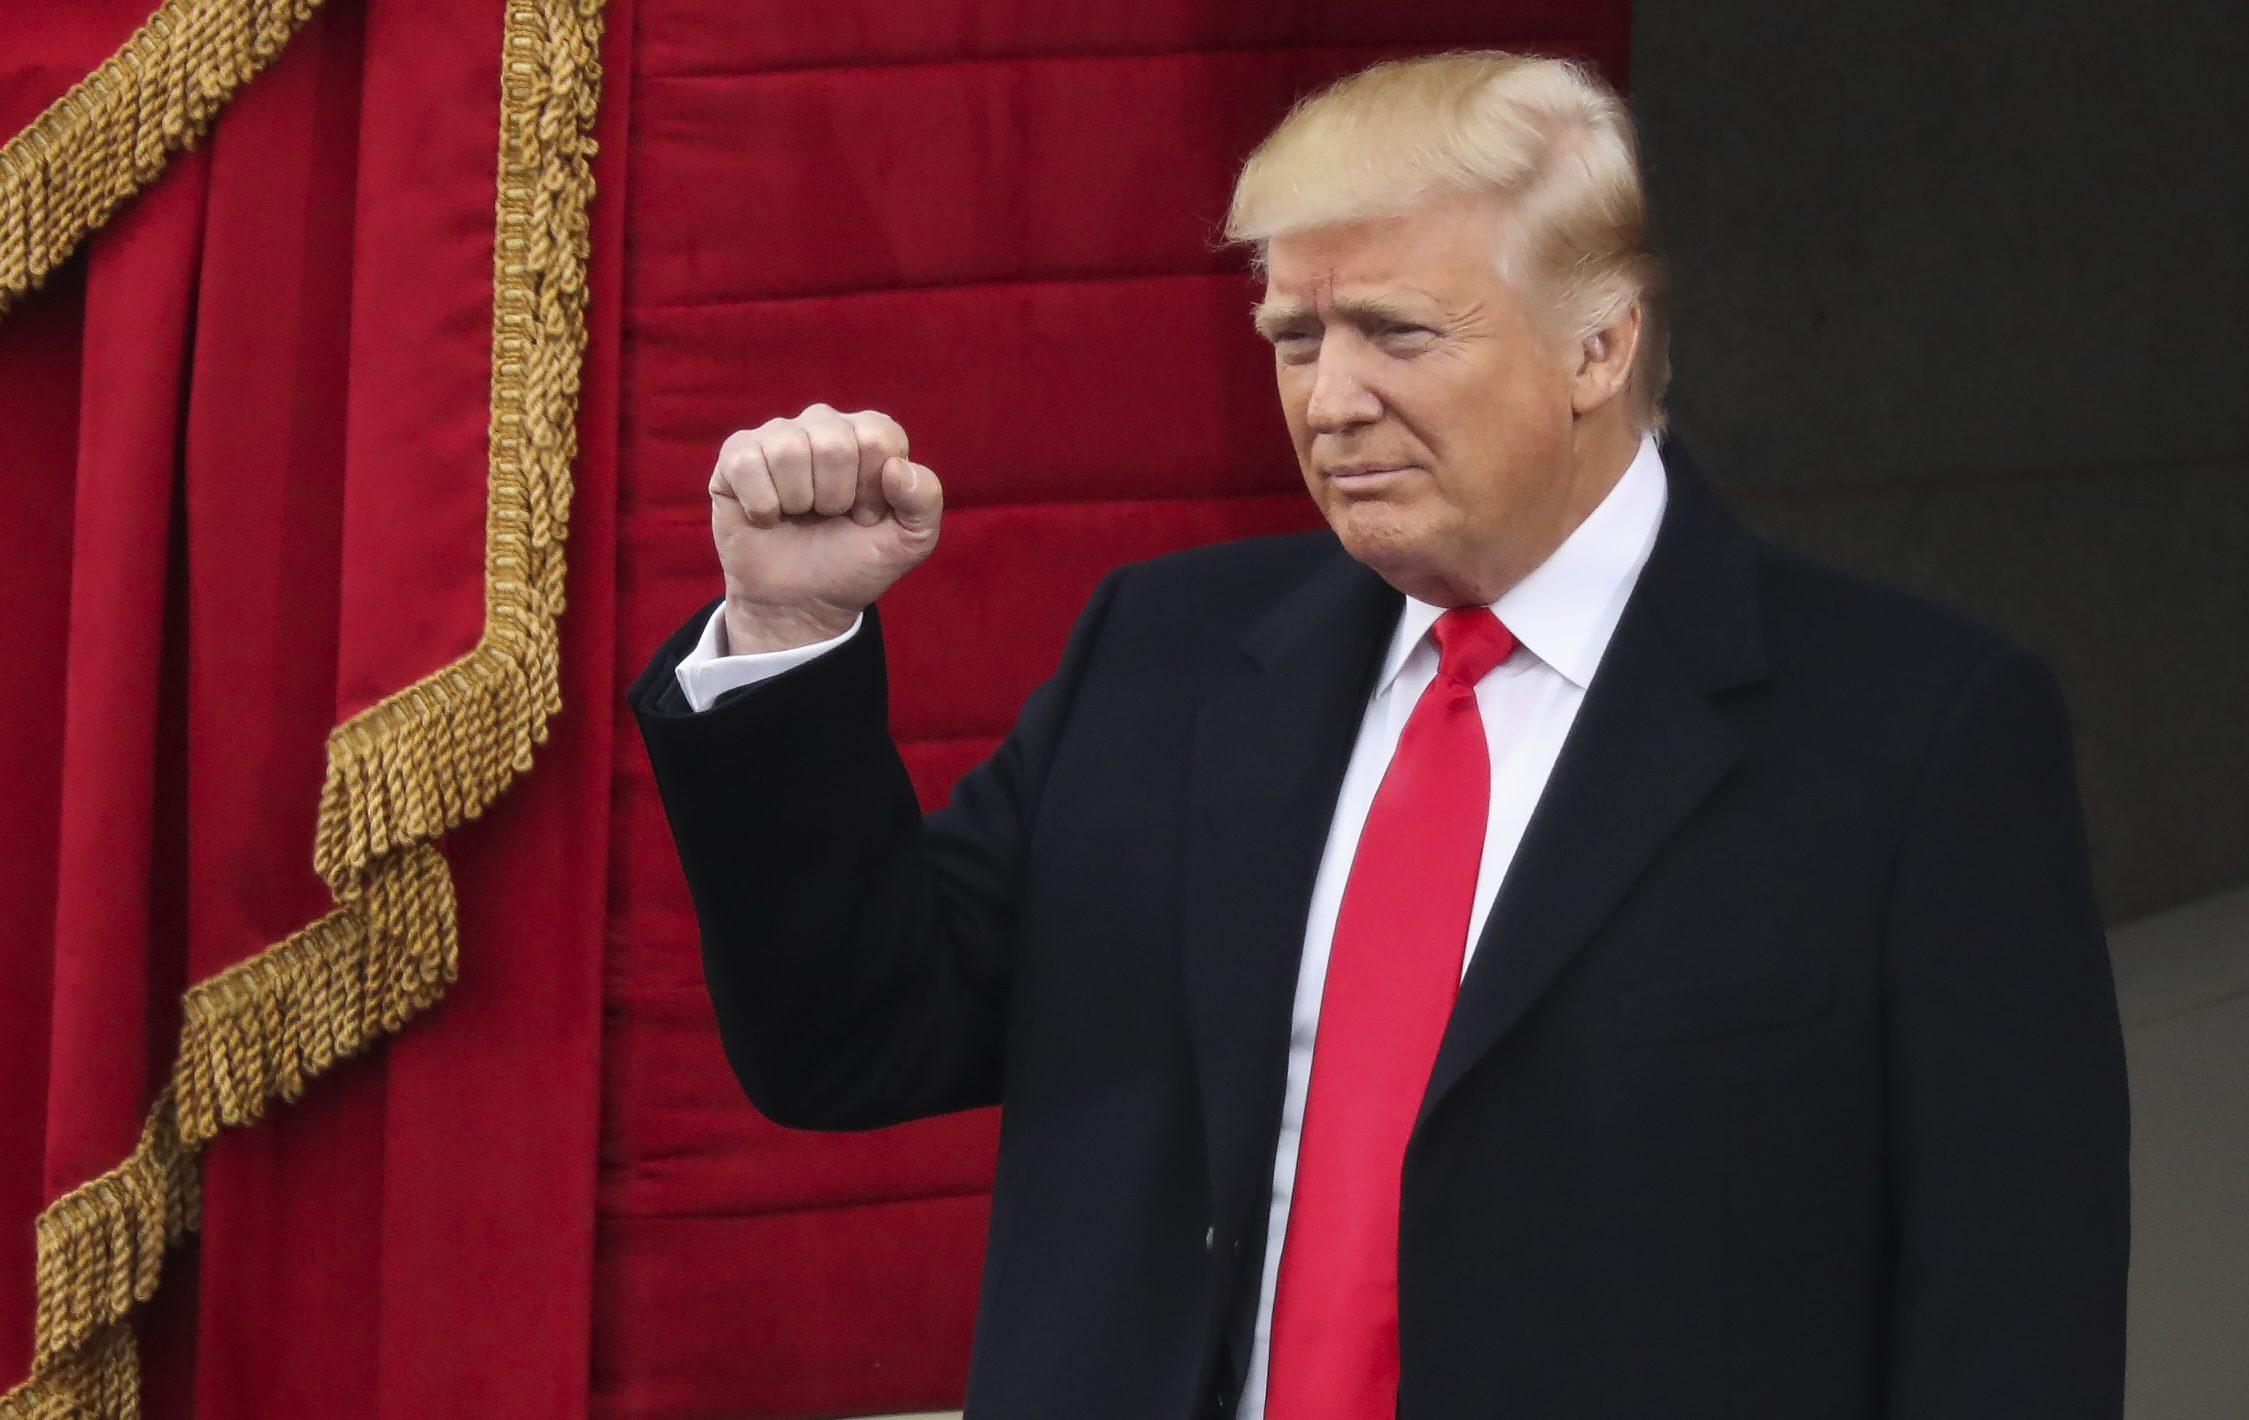 Donald Trump at his inauguration ceremony